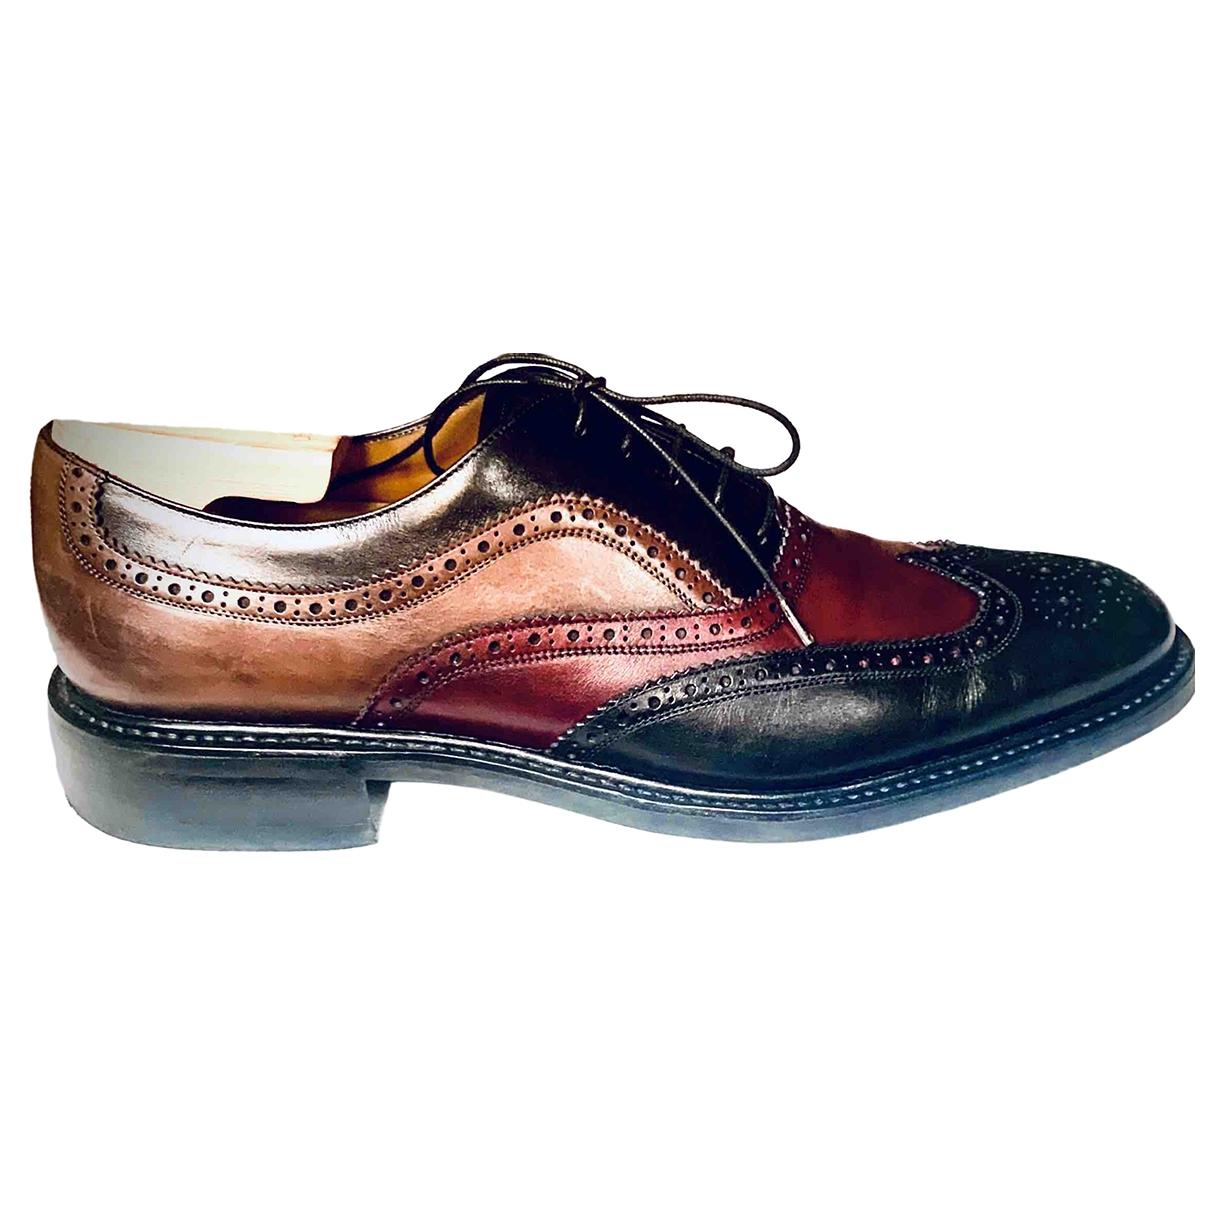 Salvatore Ferragamo \N Multicolour Leather Lace ups for Men 10 UK